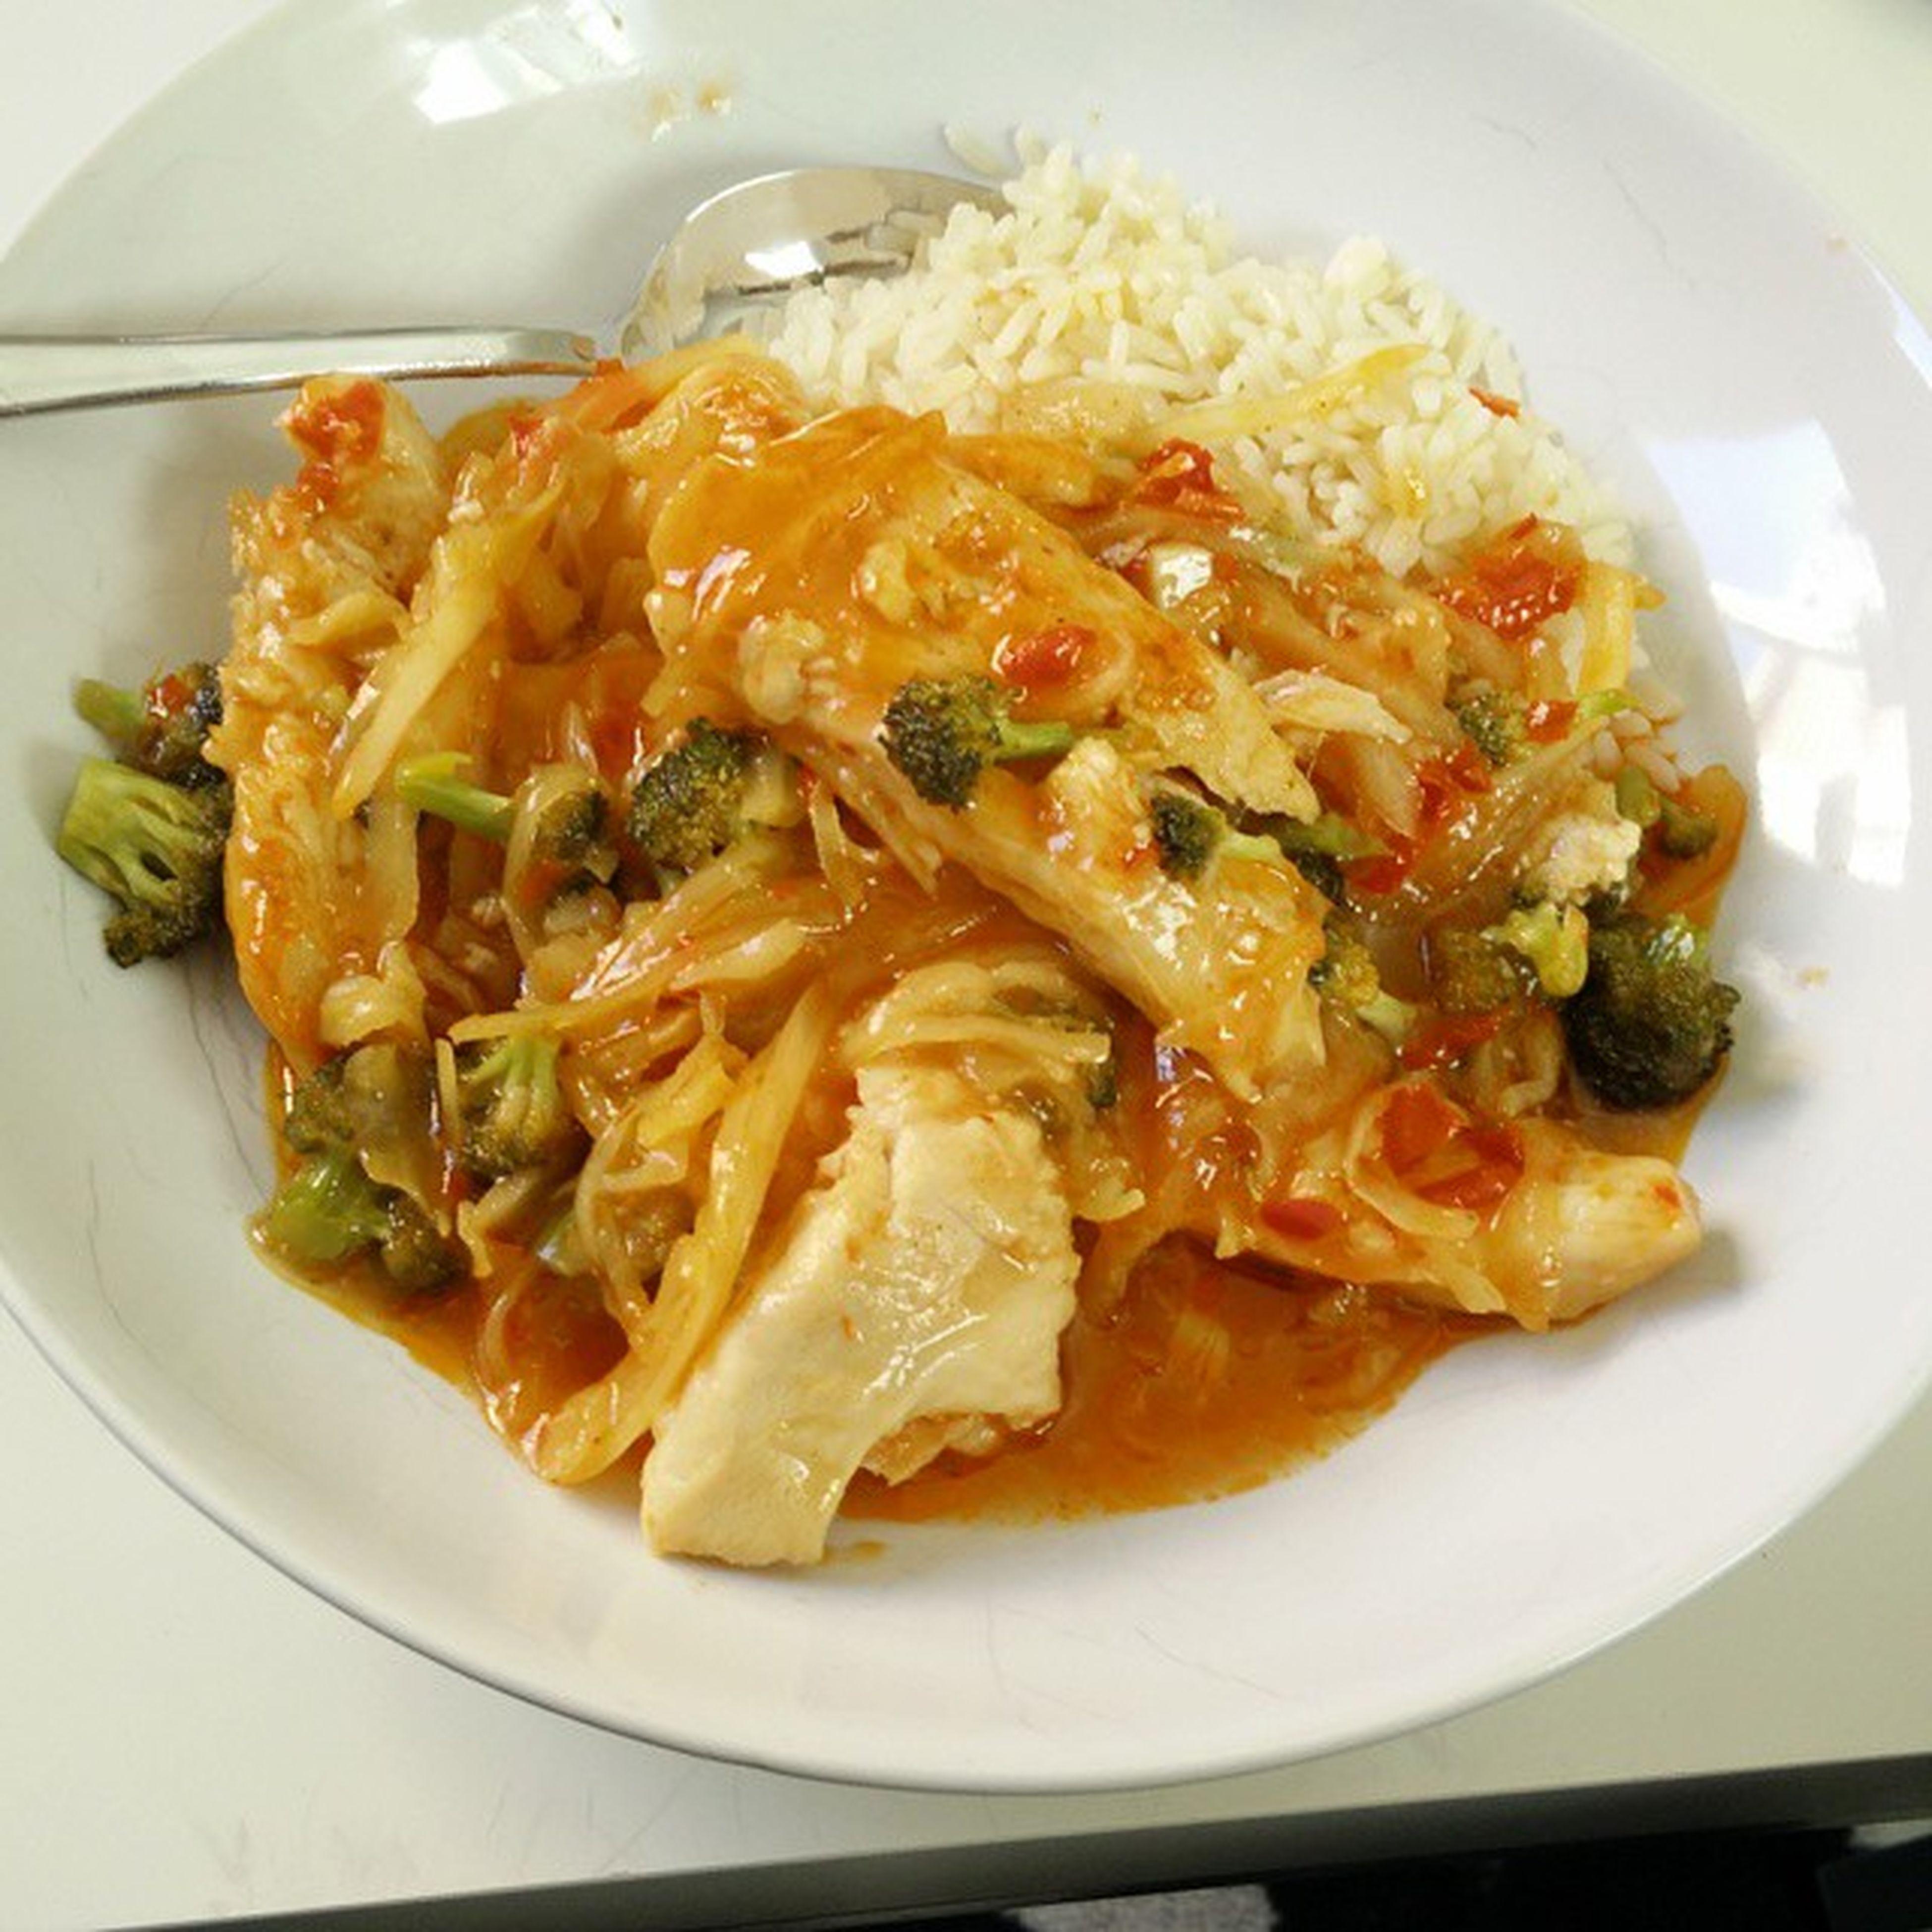 Kinamat blev det idag! 😁👍💖😘 Hemmalagadmat Kinamat Fredagsmat